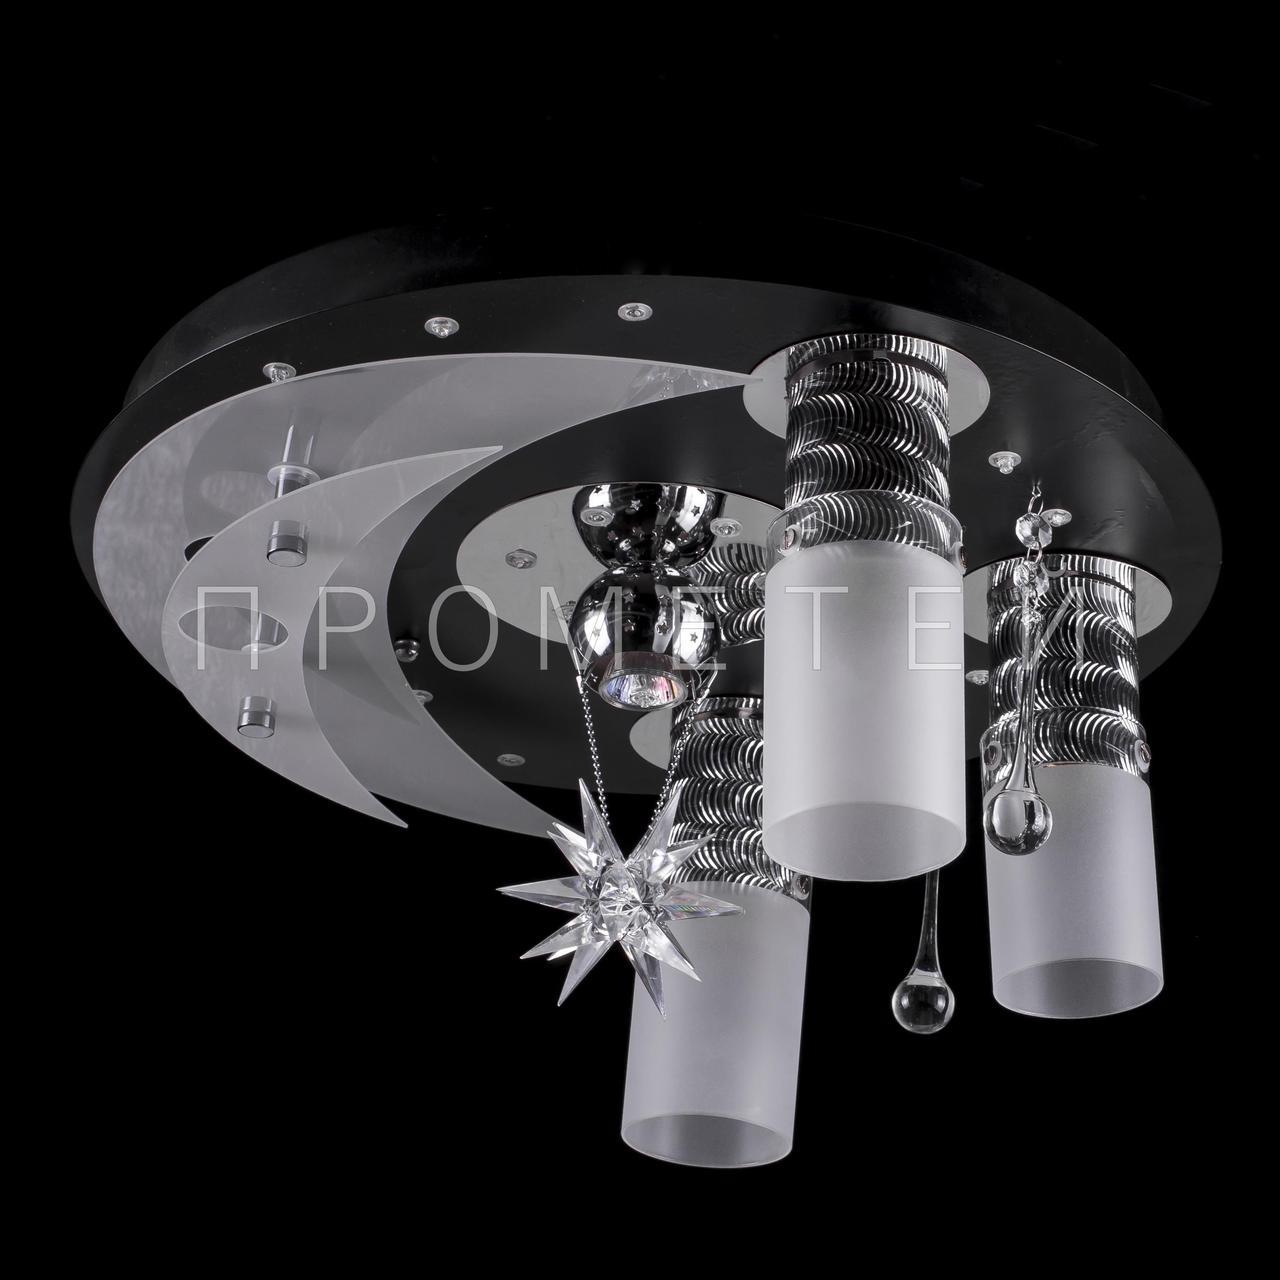 "Люстра ""космос"" с LED подсветкой на пульте управления. P5-S0706/3+1/CH+BK+WT"